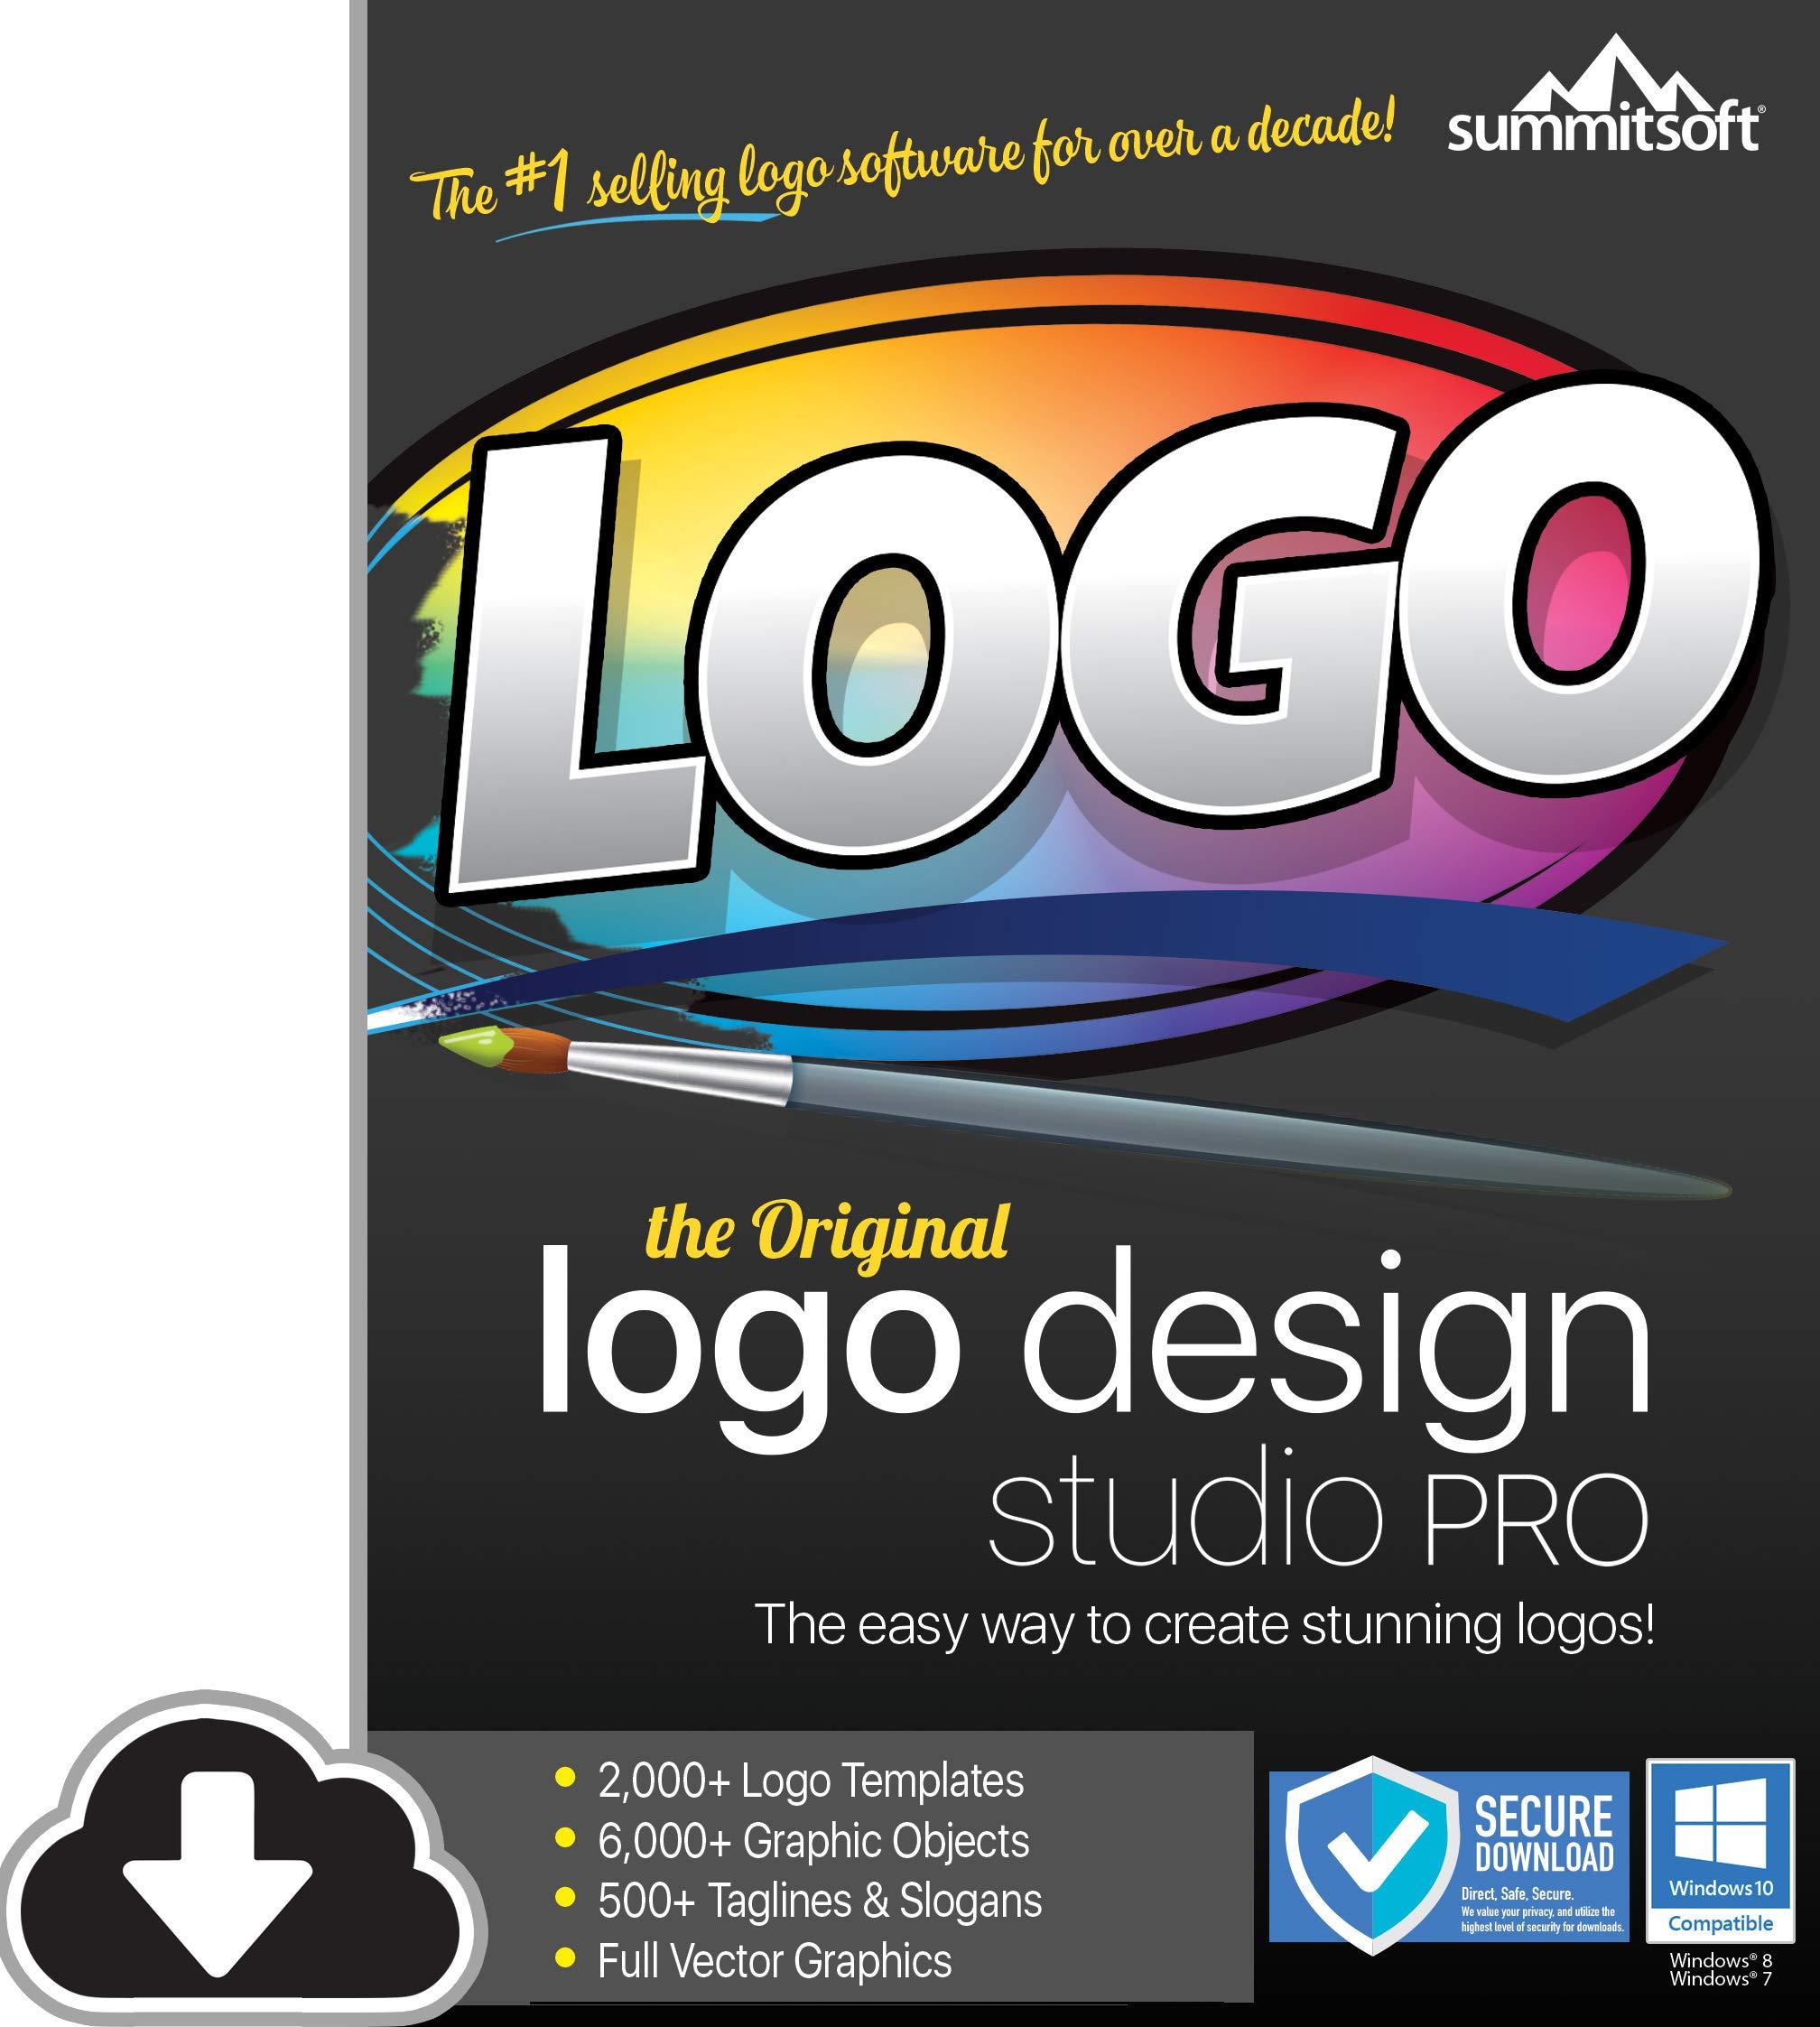 Logo Design Studio Pro v1.7.7 [PC Download] by Summitsoft